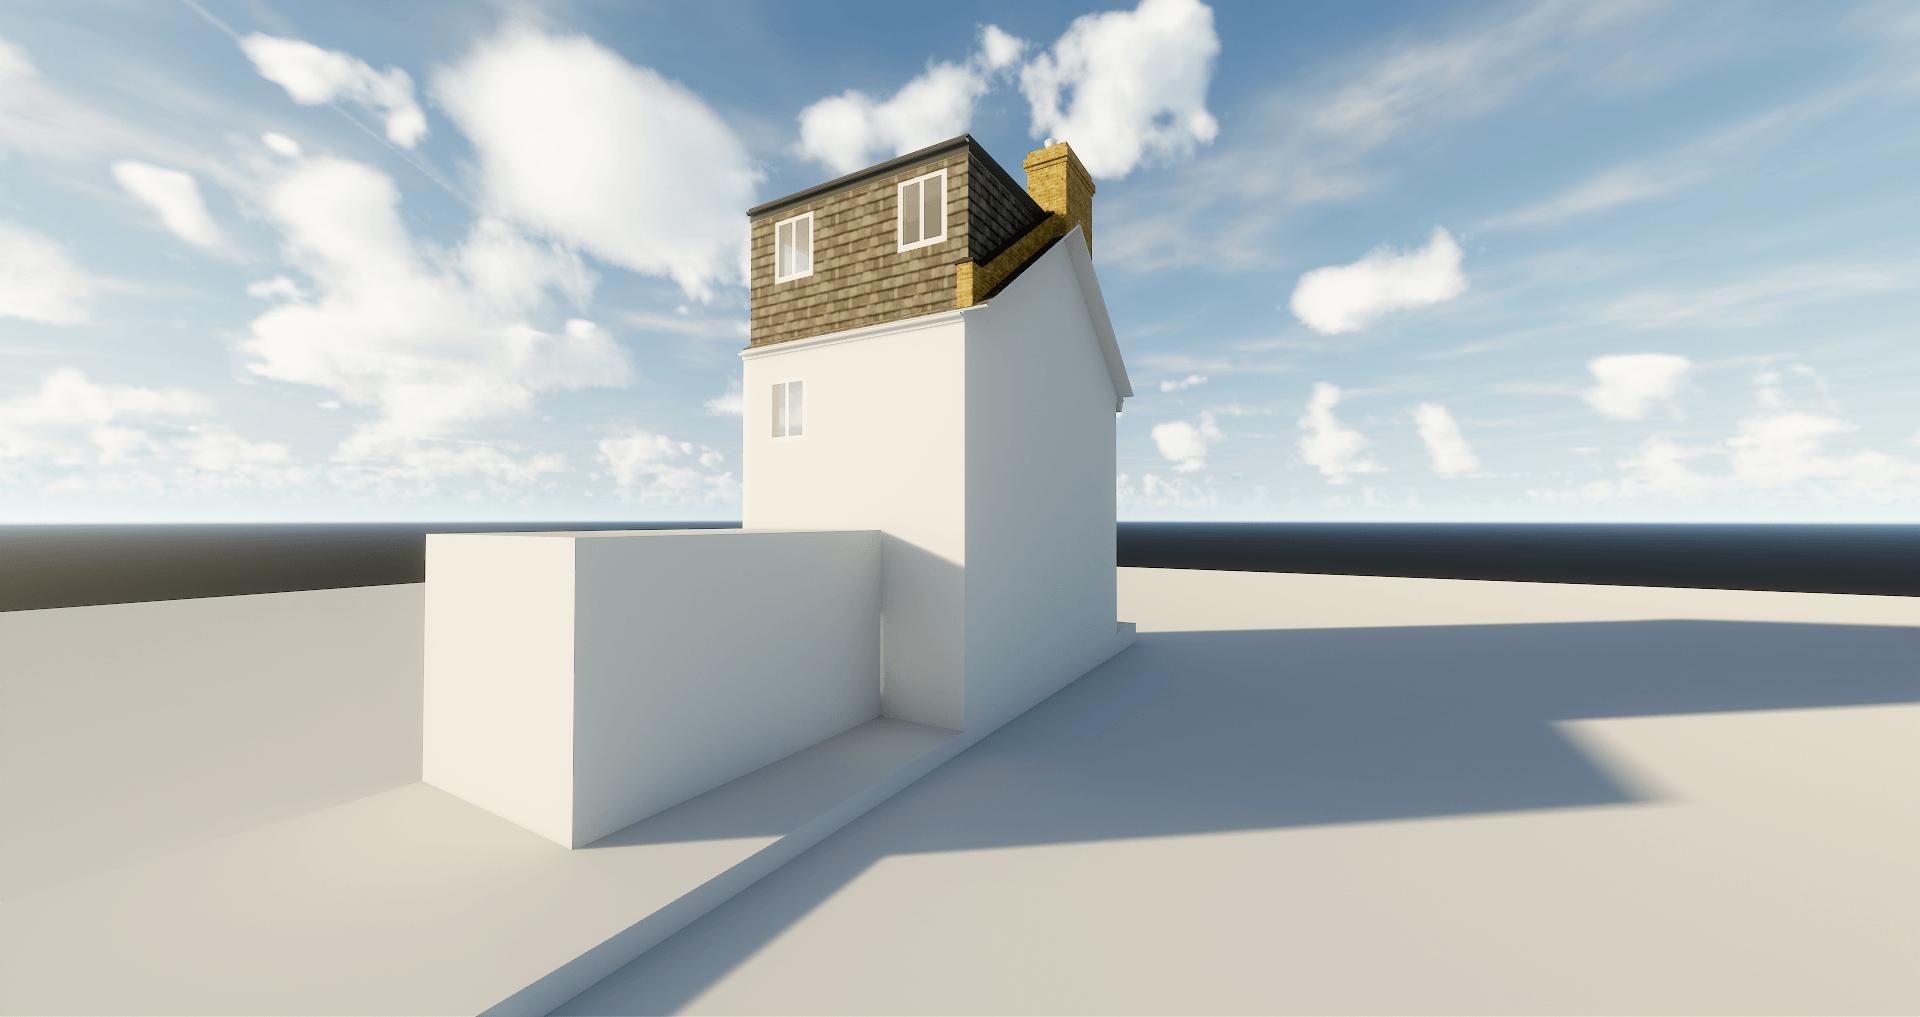 Graphic of Rear Dormer loft conversion